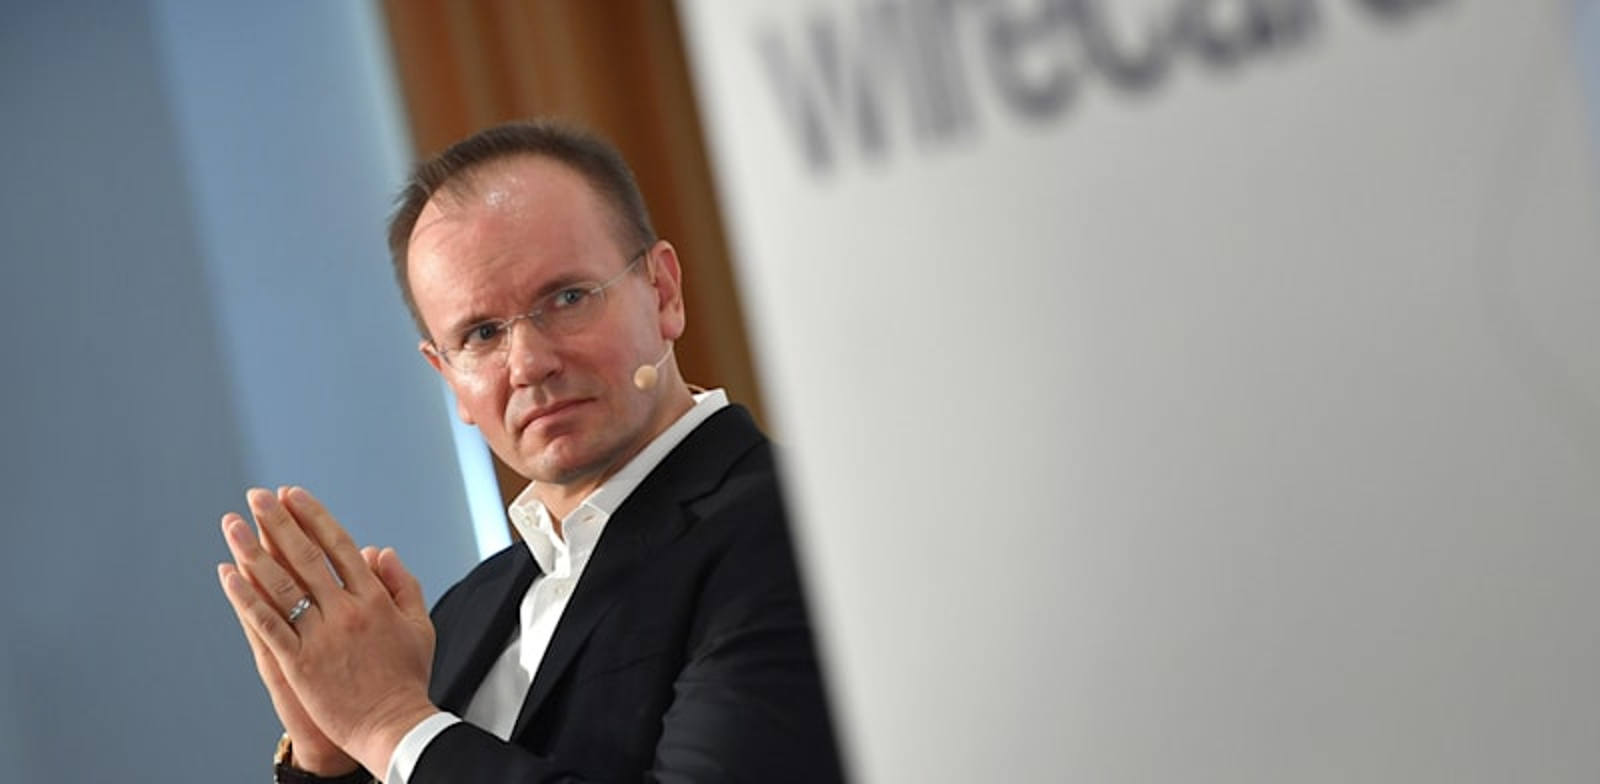 מרקוס בראון, מנכ״ל וויירקארד, הנמצא כעת במעצר / צילום: Reuters